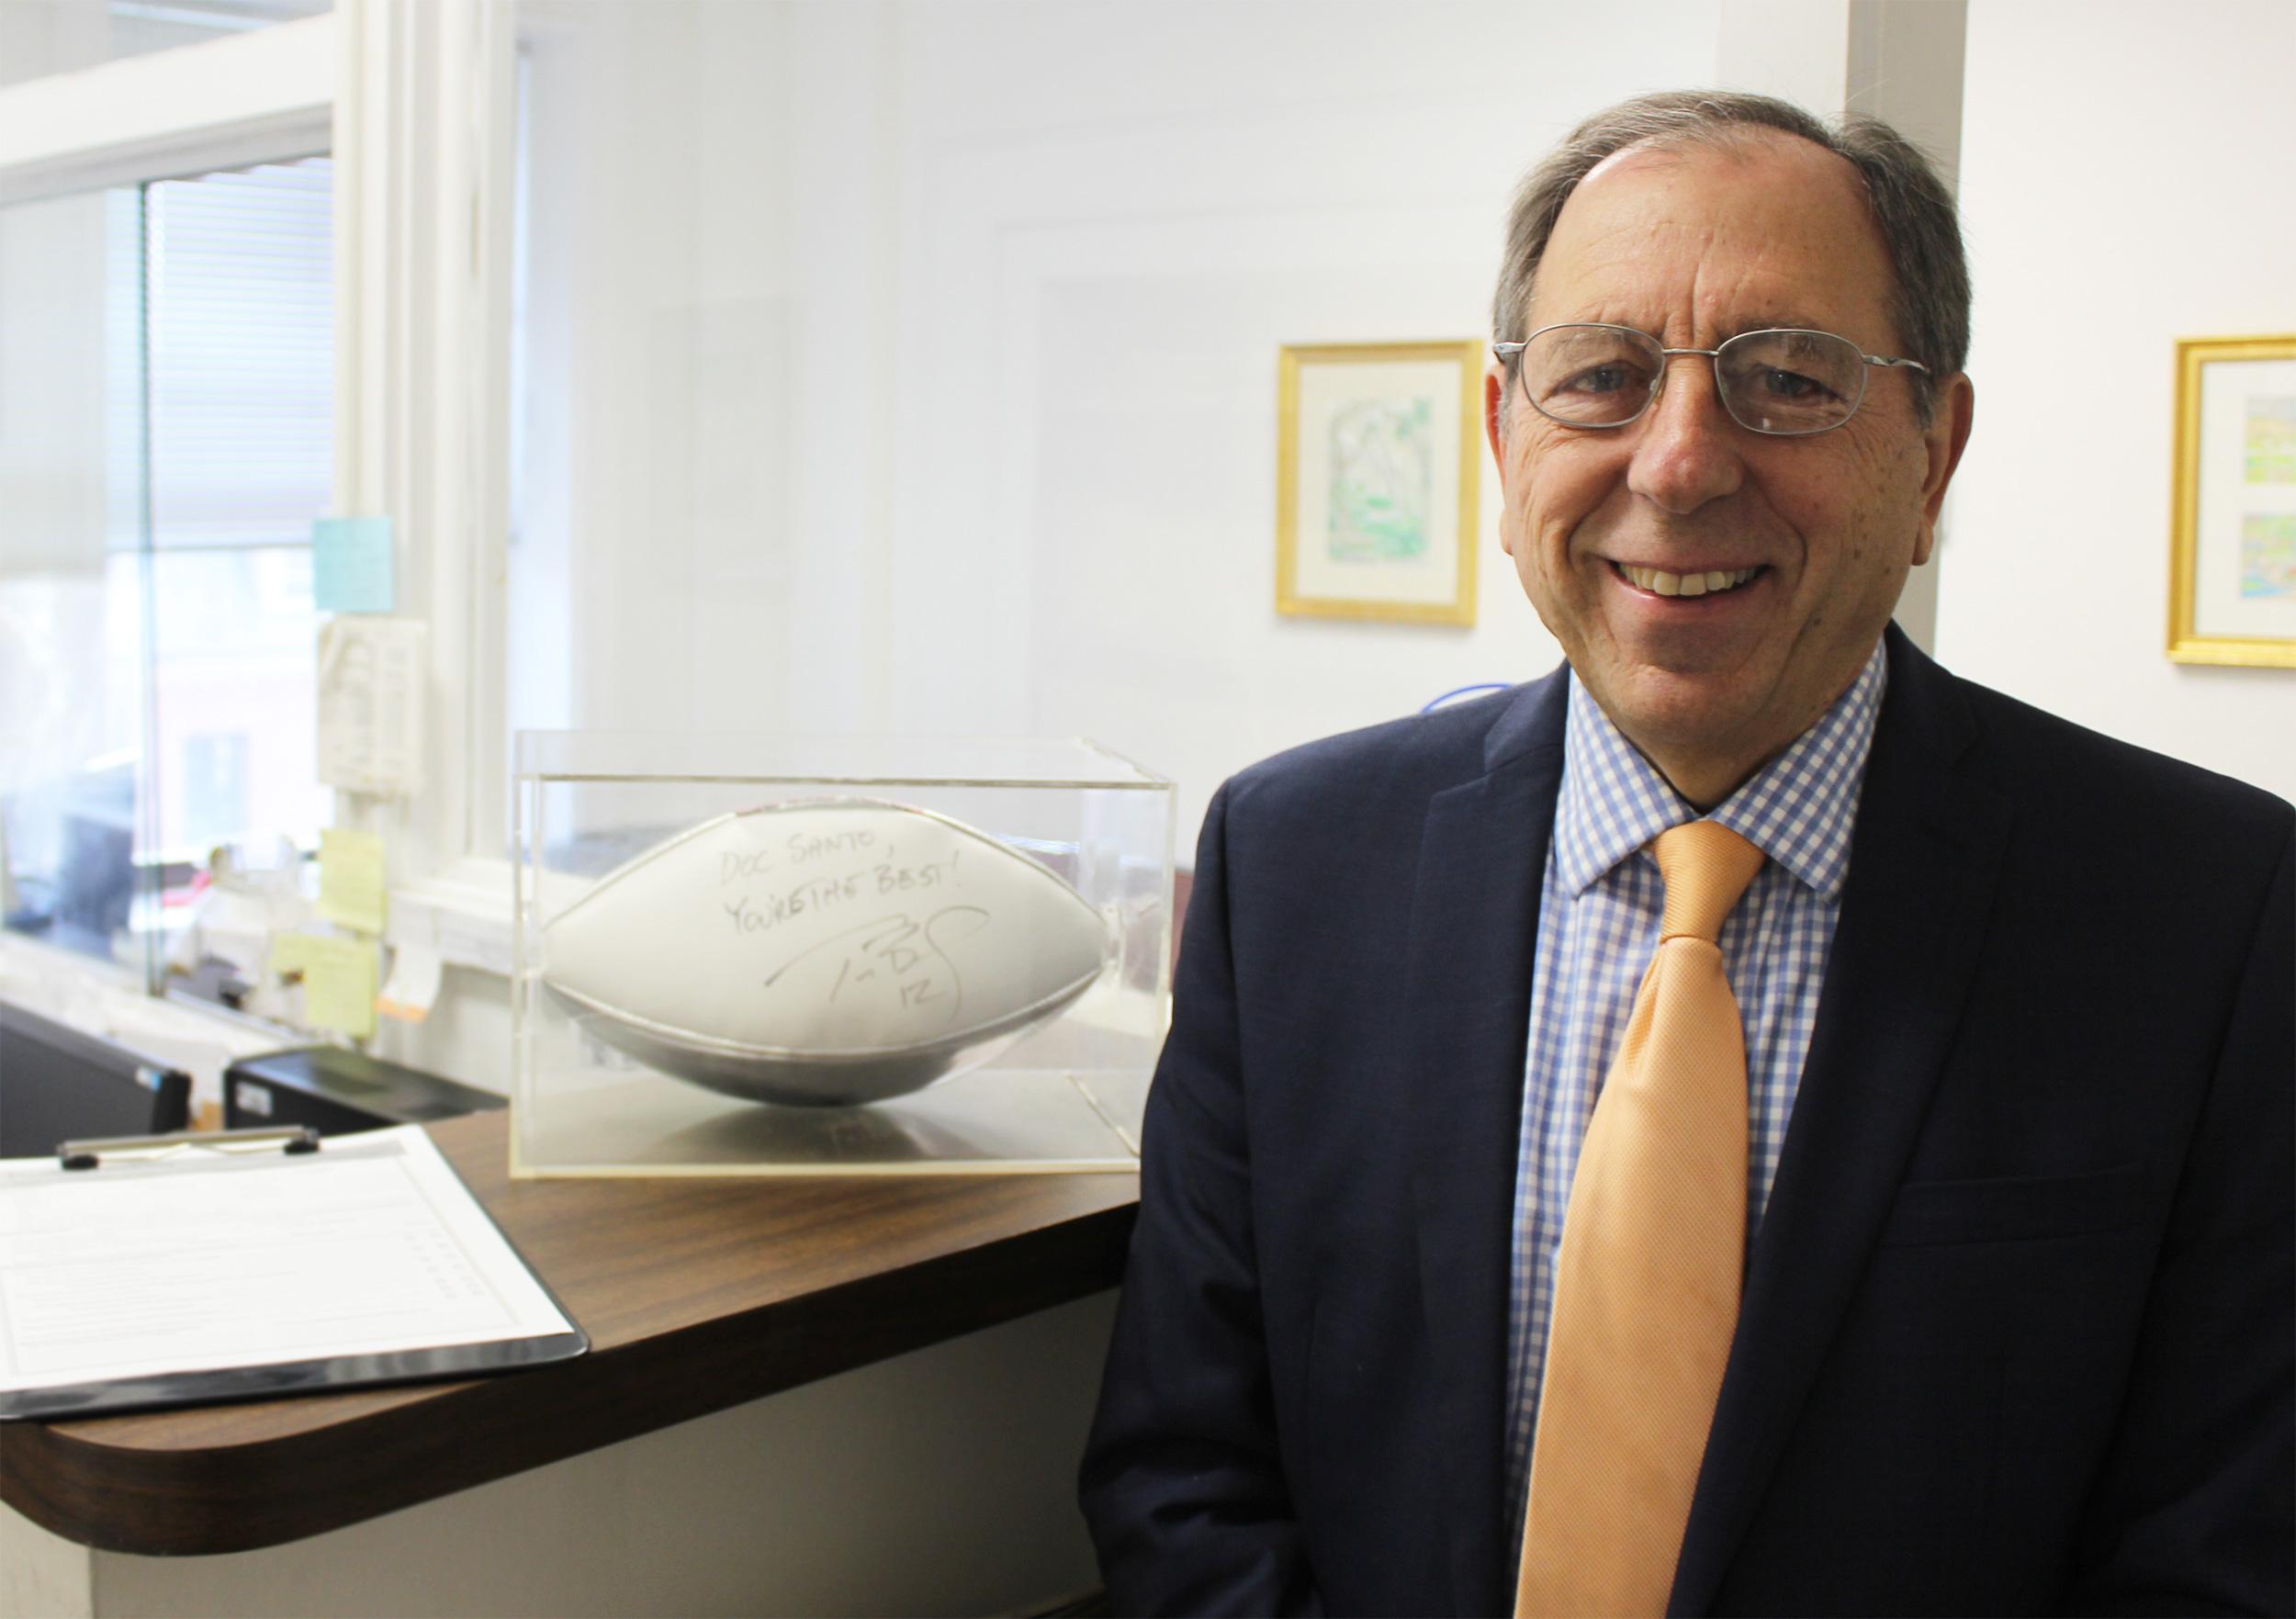 Dr. Frank J. Santopietro, D.P.M. at his Brookline, Massachusetts practice.